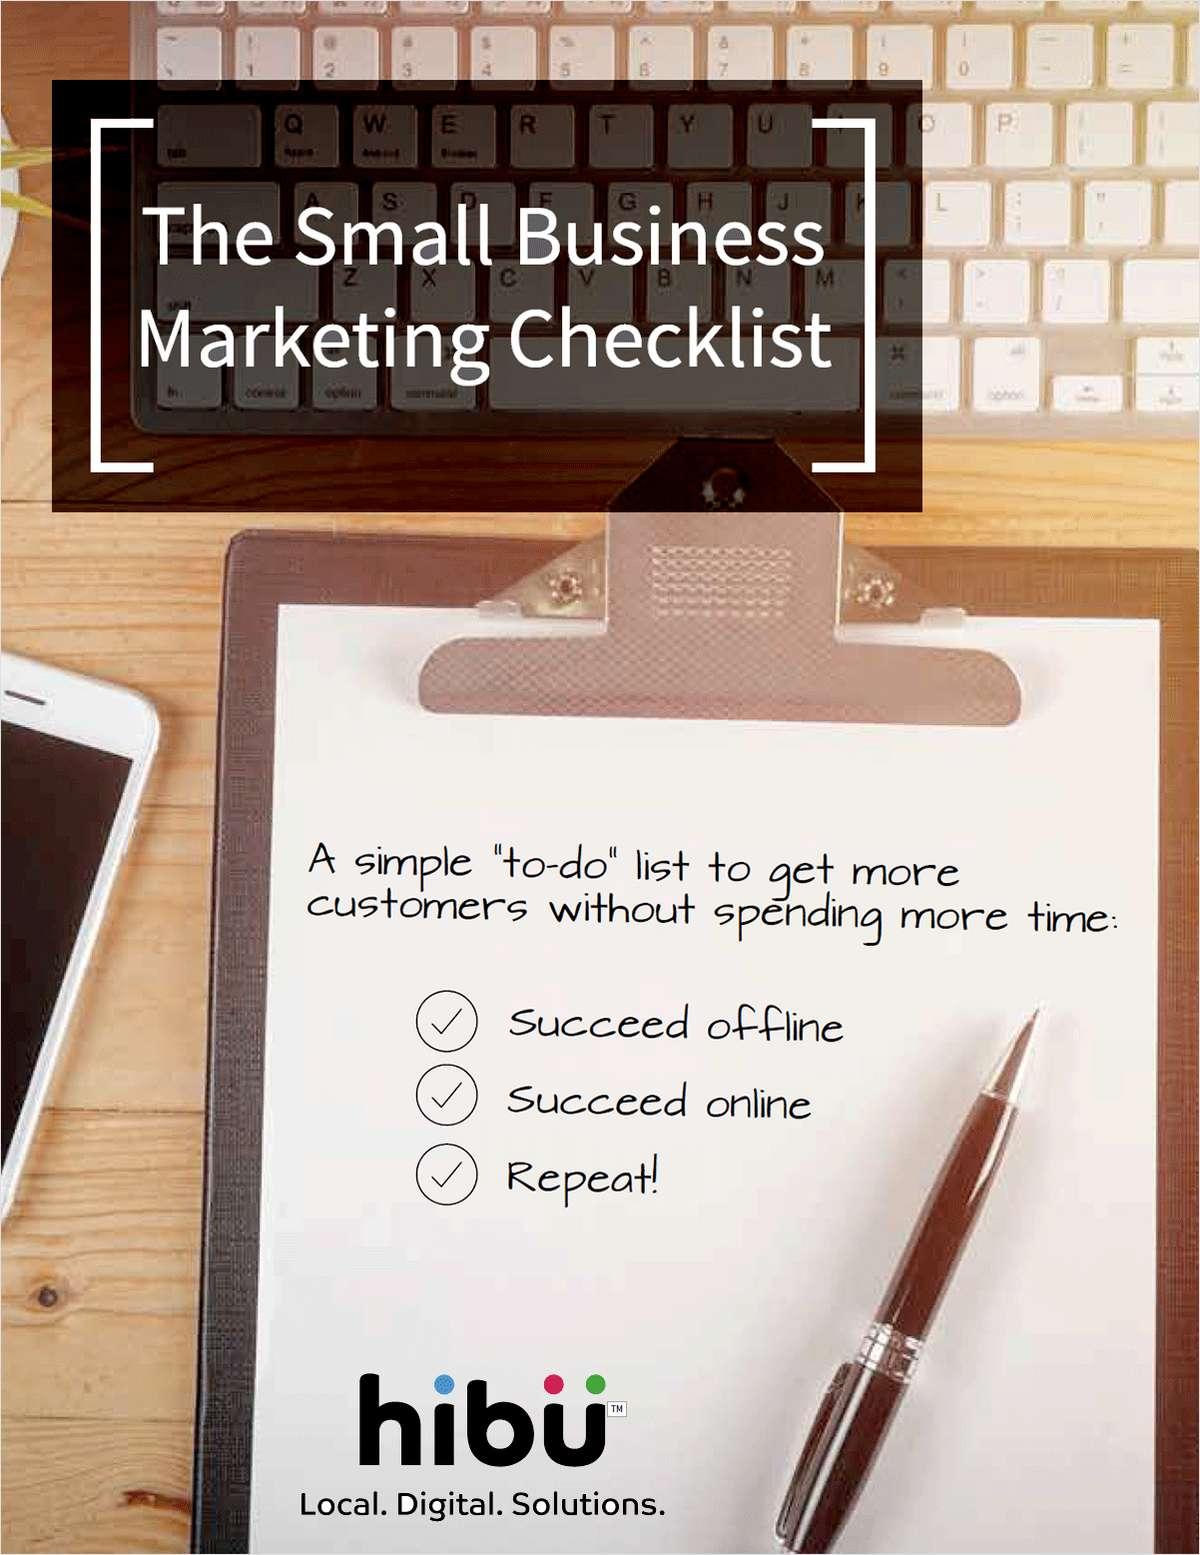 The Small Business Marketing Checklist